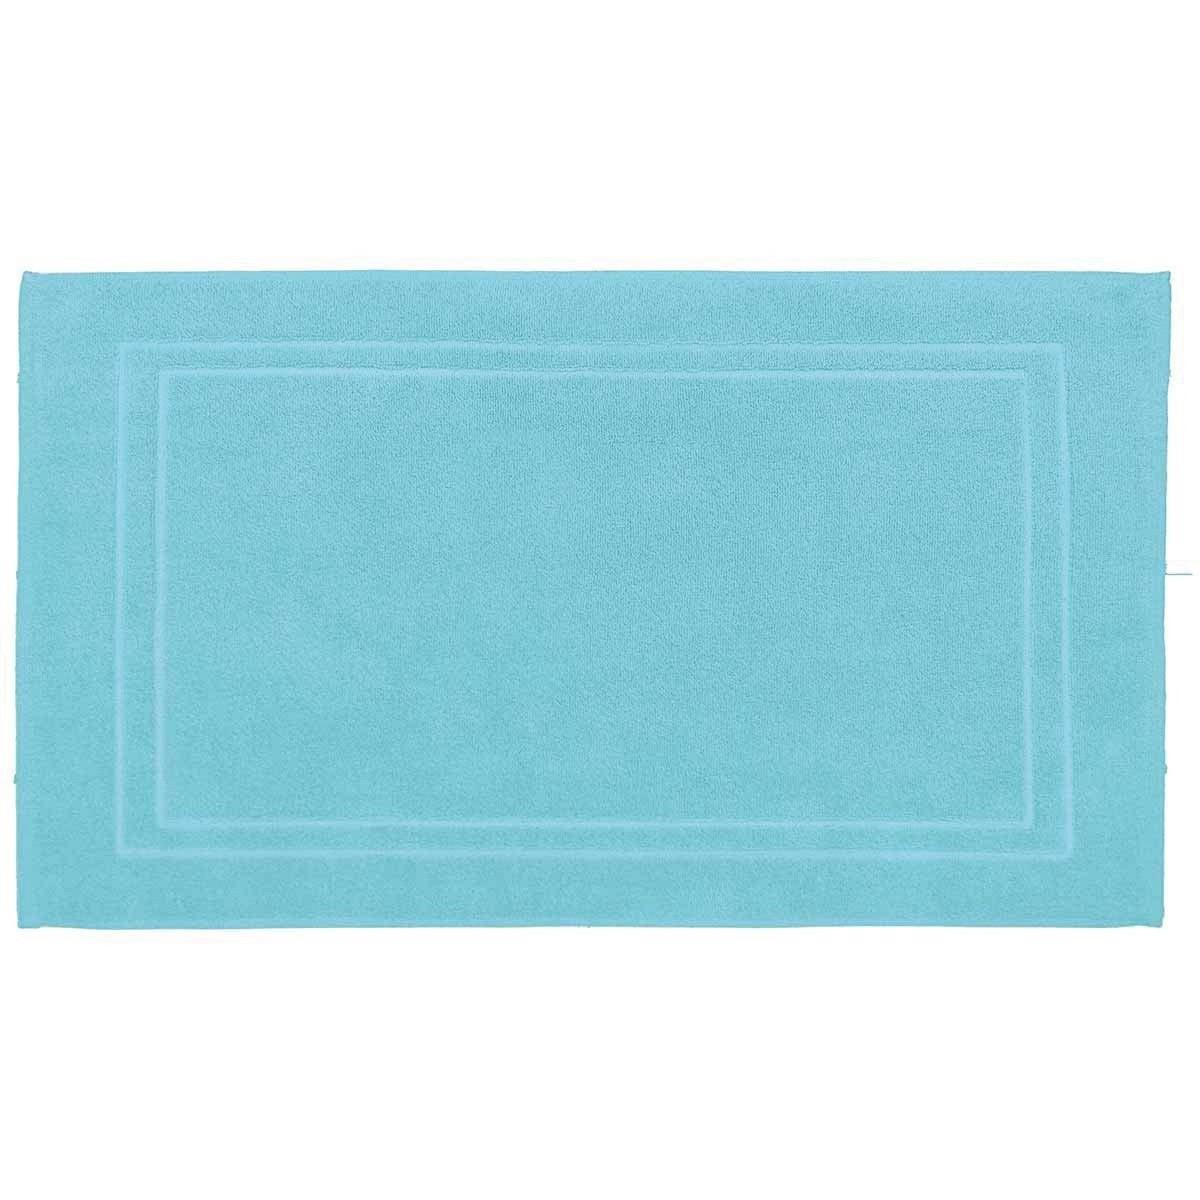 Tapis de bain 900gr/m² Bleu Turquoise 50x80 cm